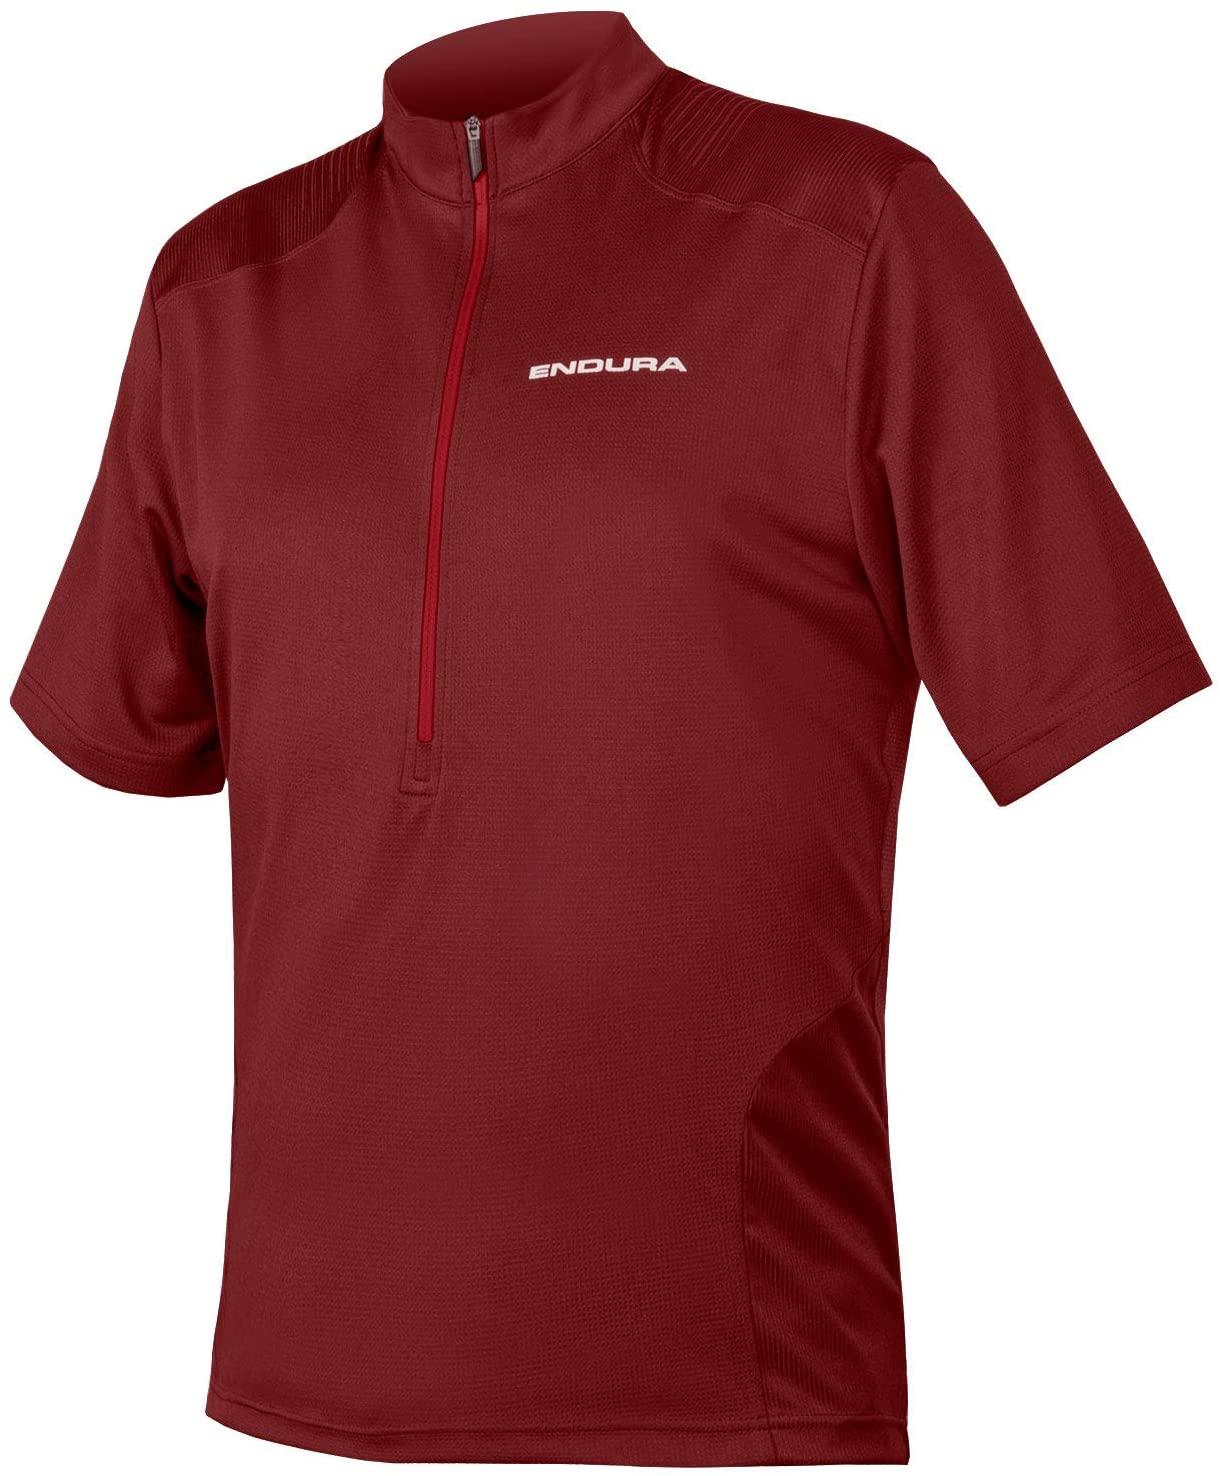 Endura Men's Hummvee Short Sleeve Cycling Jersey Cocoa, X-Large